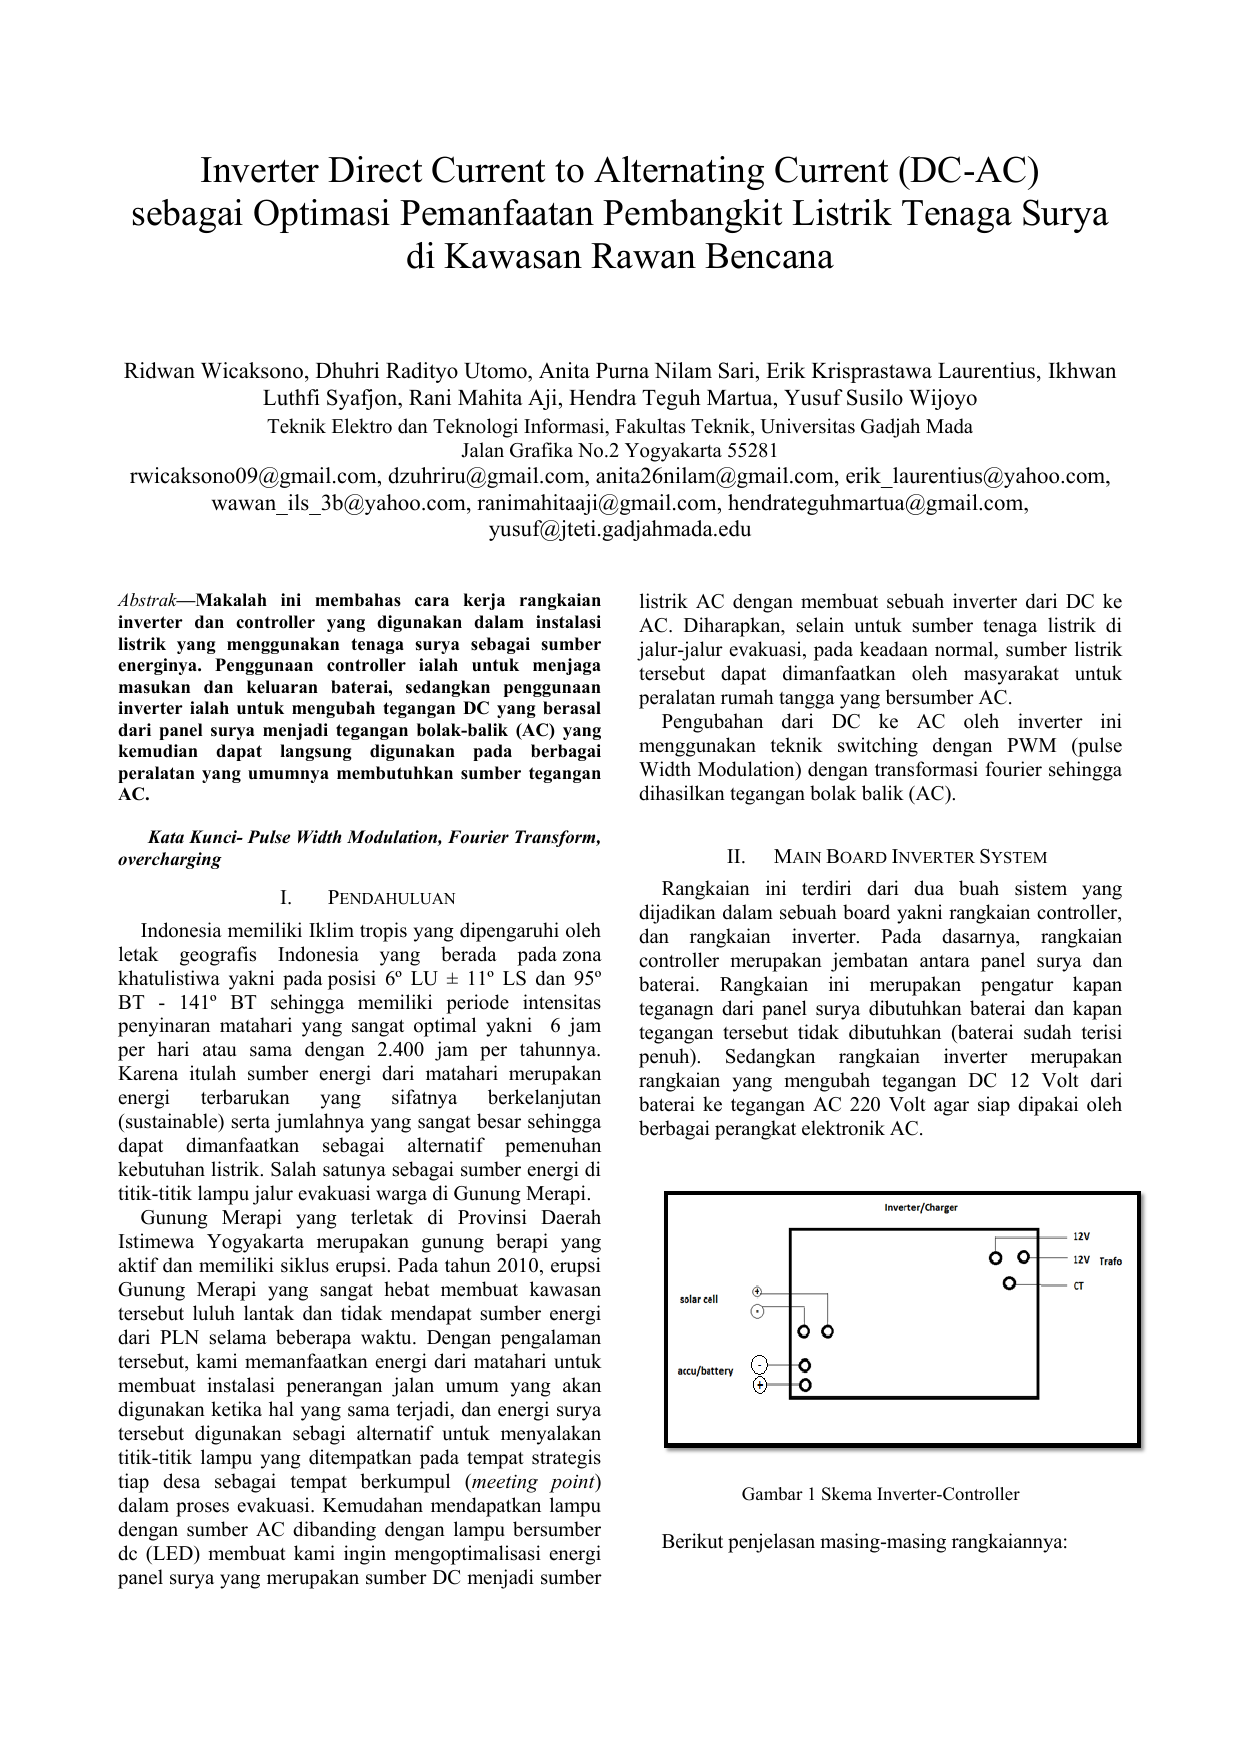 Inverter Direct Current To Alternating Current Dc